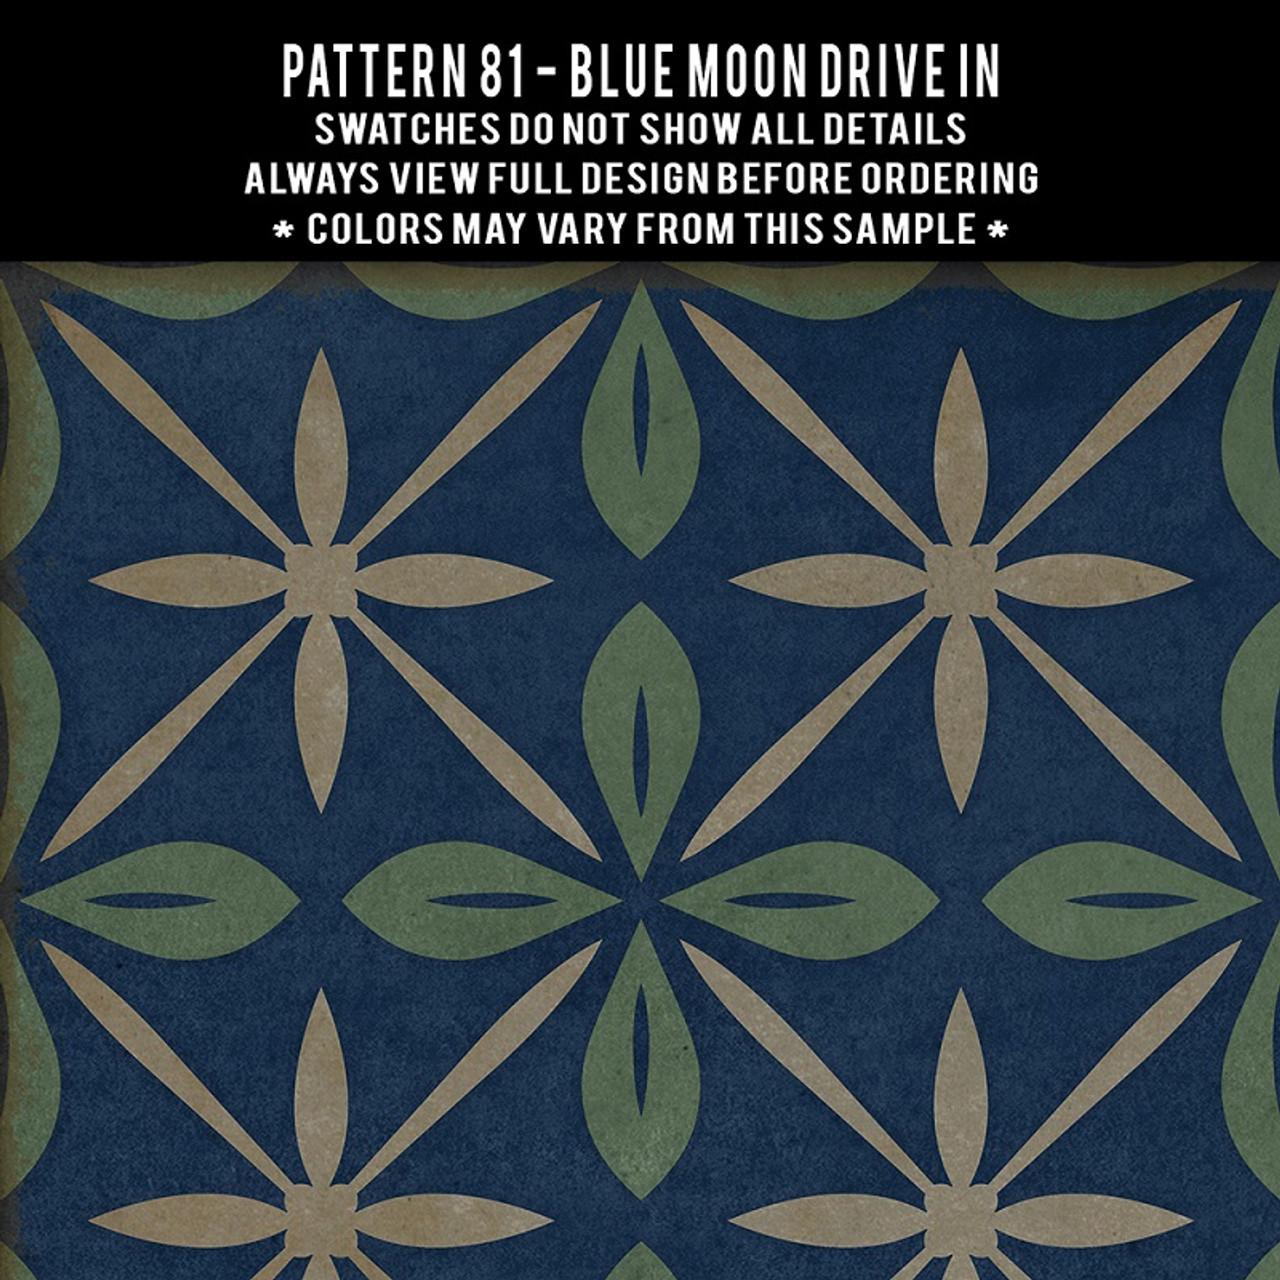 Swatches for Pattern 81 - vinyl floor cloths